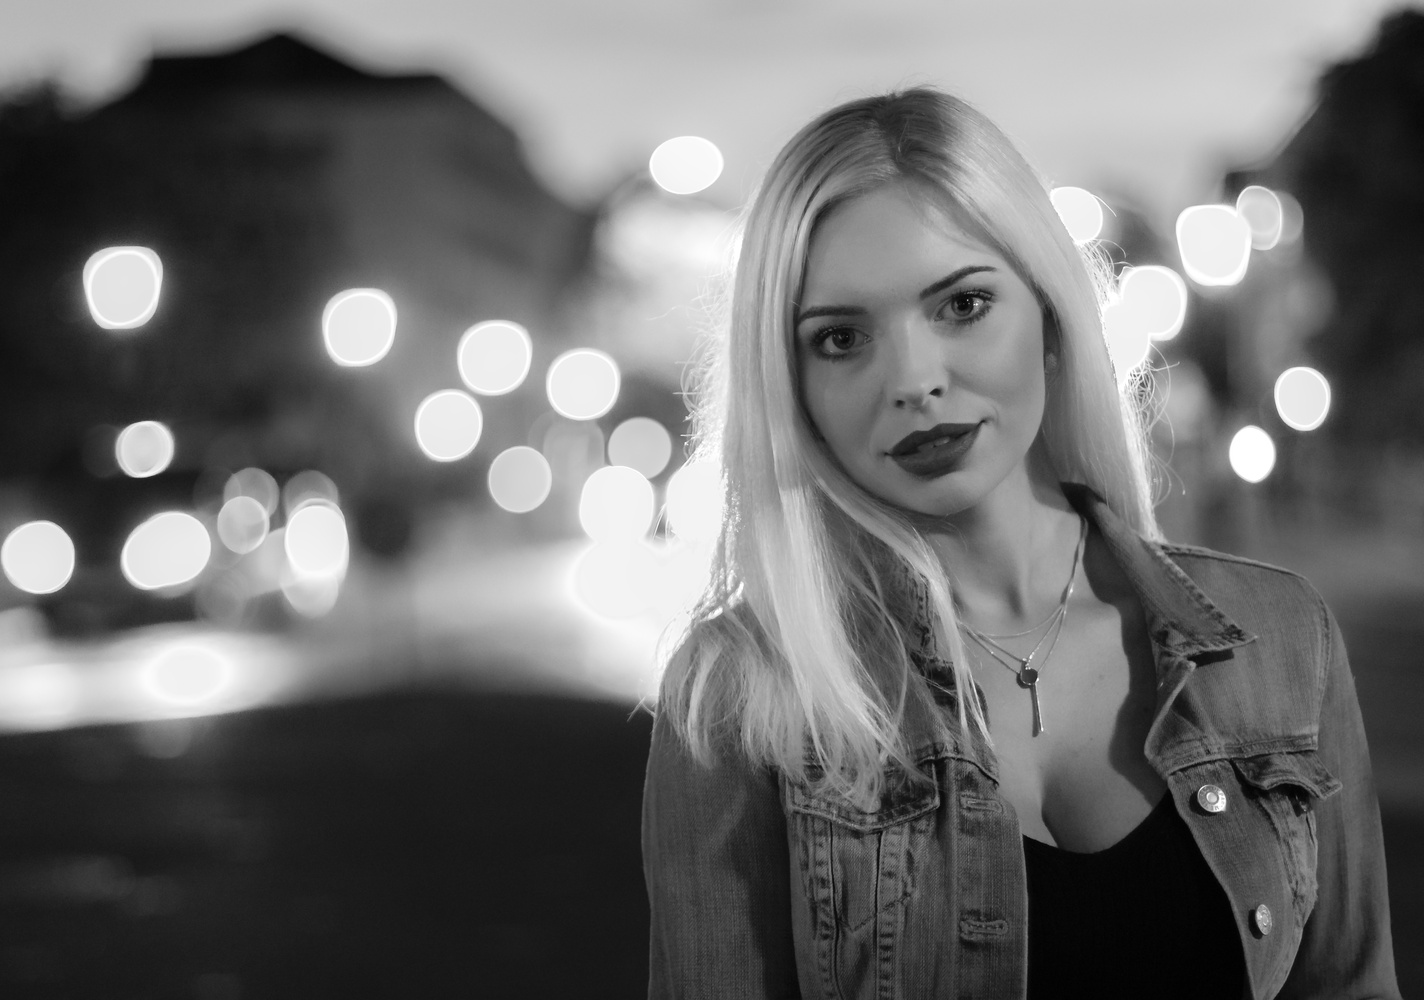 Sophia by Alex K